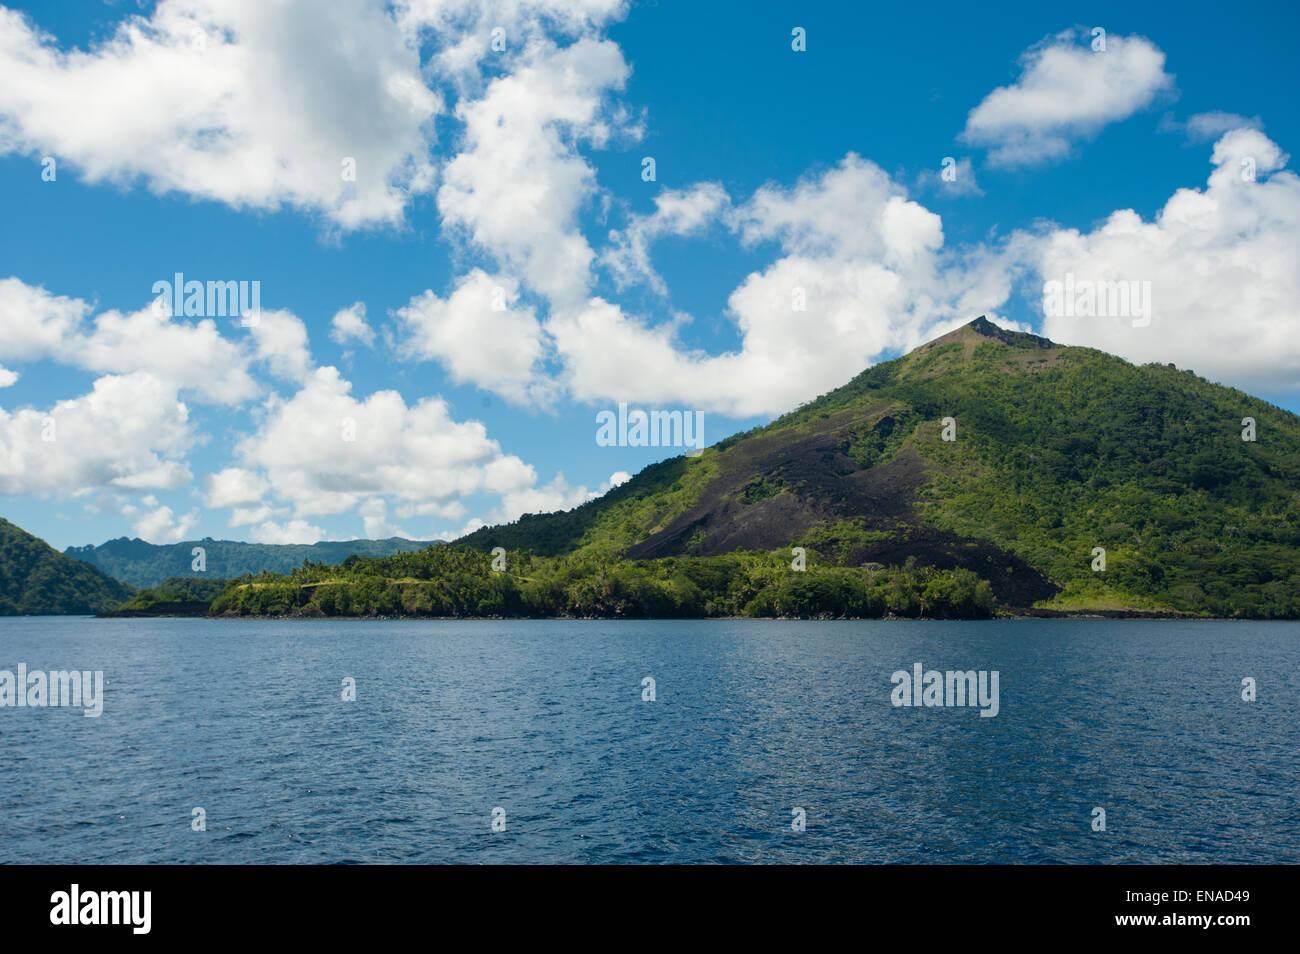 The active island volcano of Banda in the Maluku province Indonesia - Stock Image